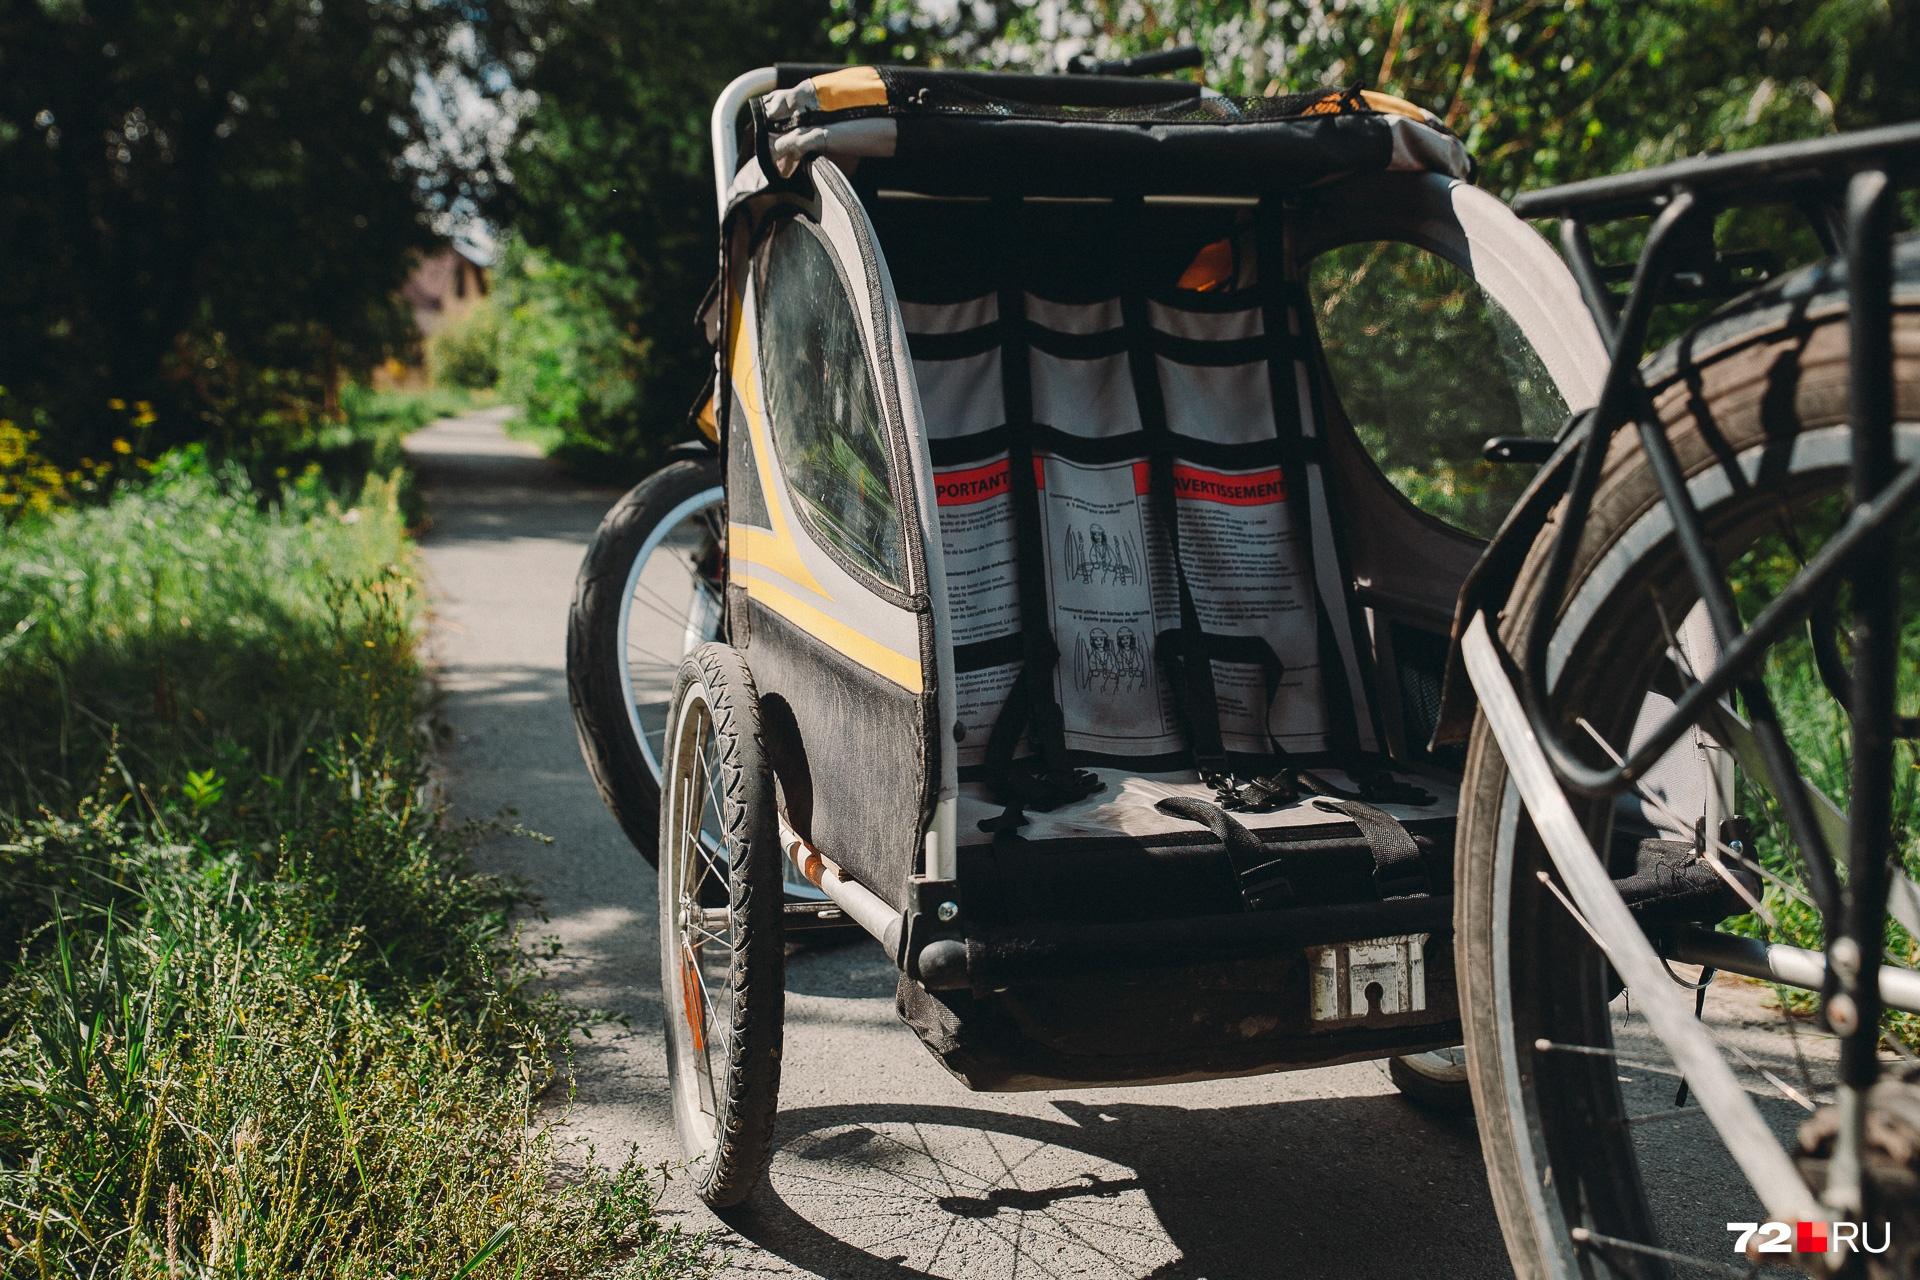 Тележка для перевозки дочки и сына. Внутри— ремни безопасности, снаружи— защитный навес от осадков и пыли